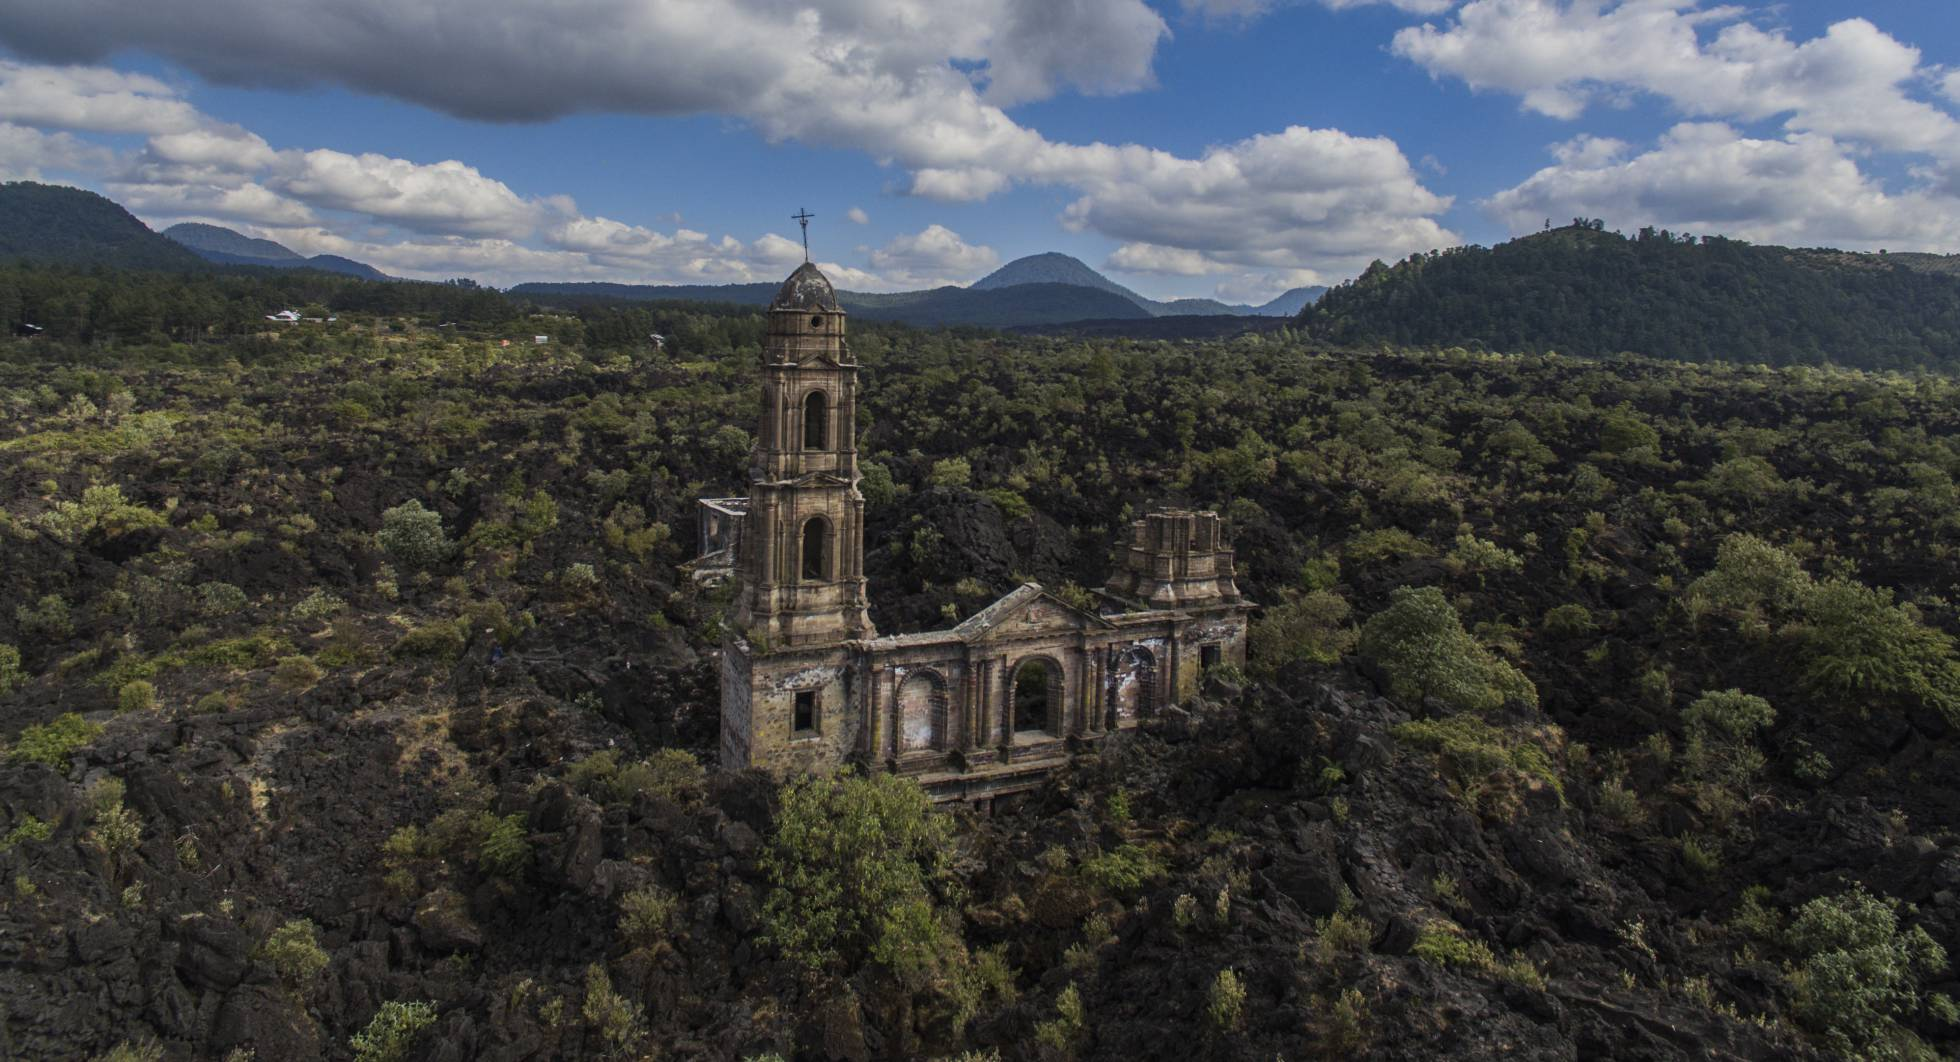 vista aérea de la iglesia de  San Juan Parangaricutiro